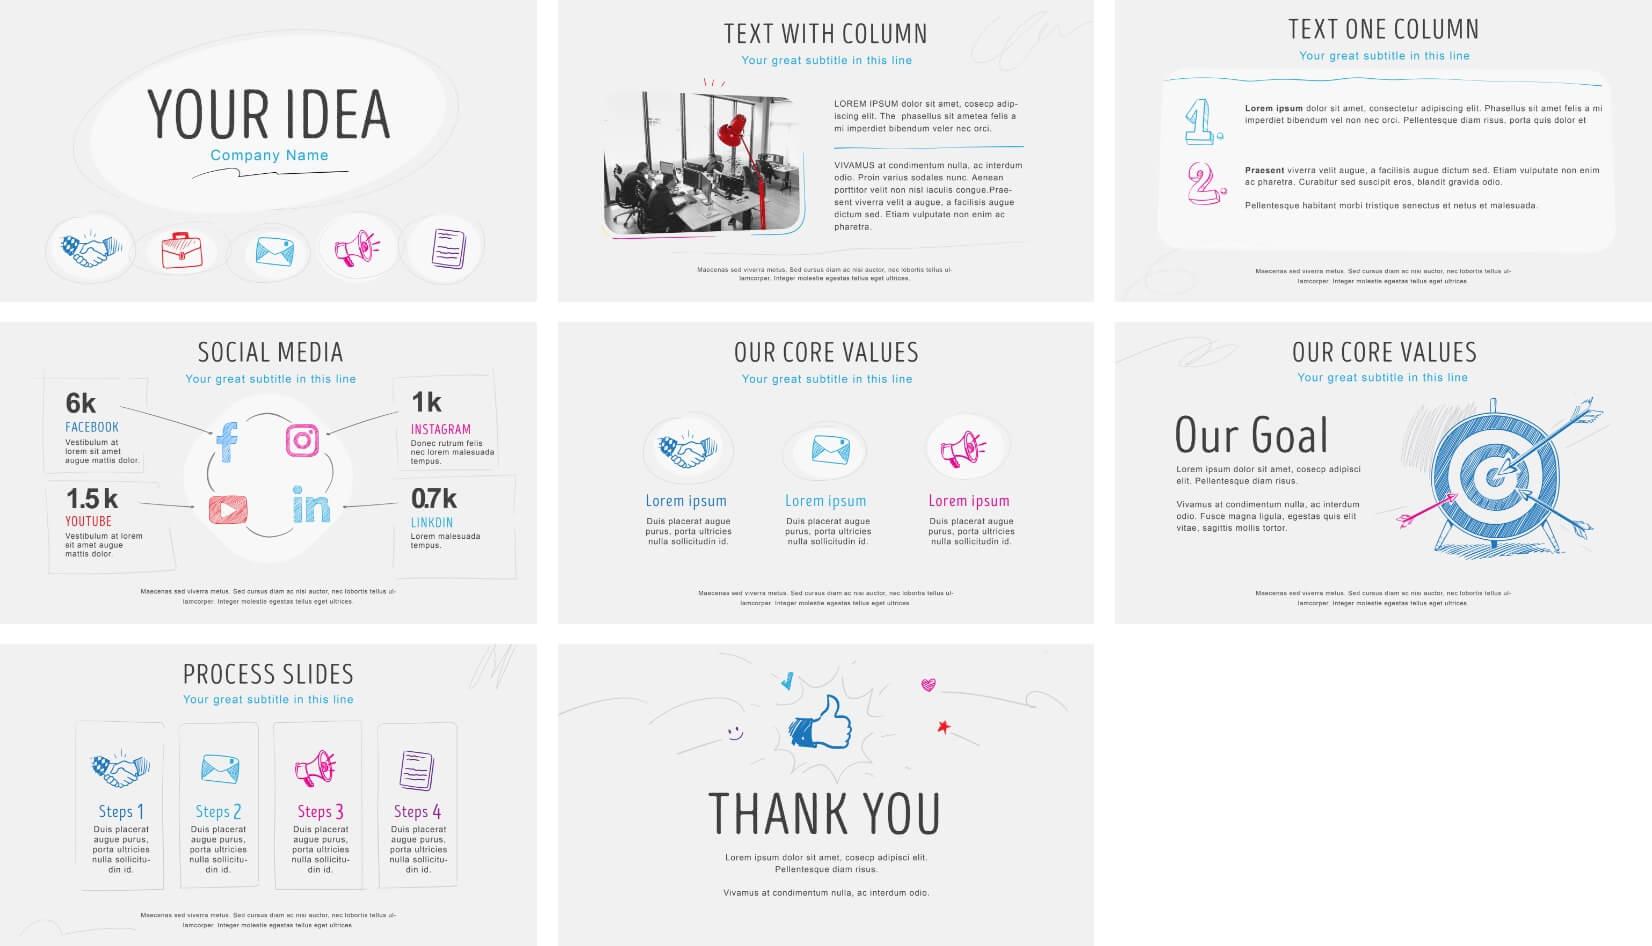 Free-Hand-Drawn-Google-Slides-Presentation-Previews.